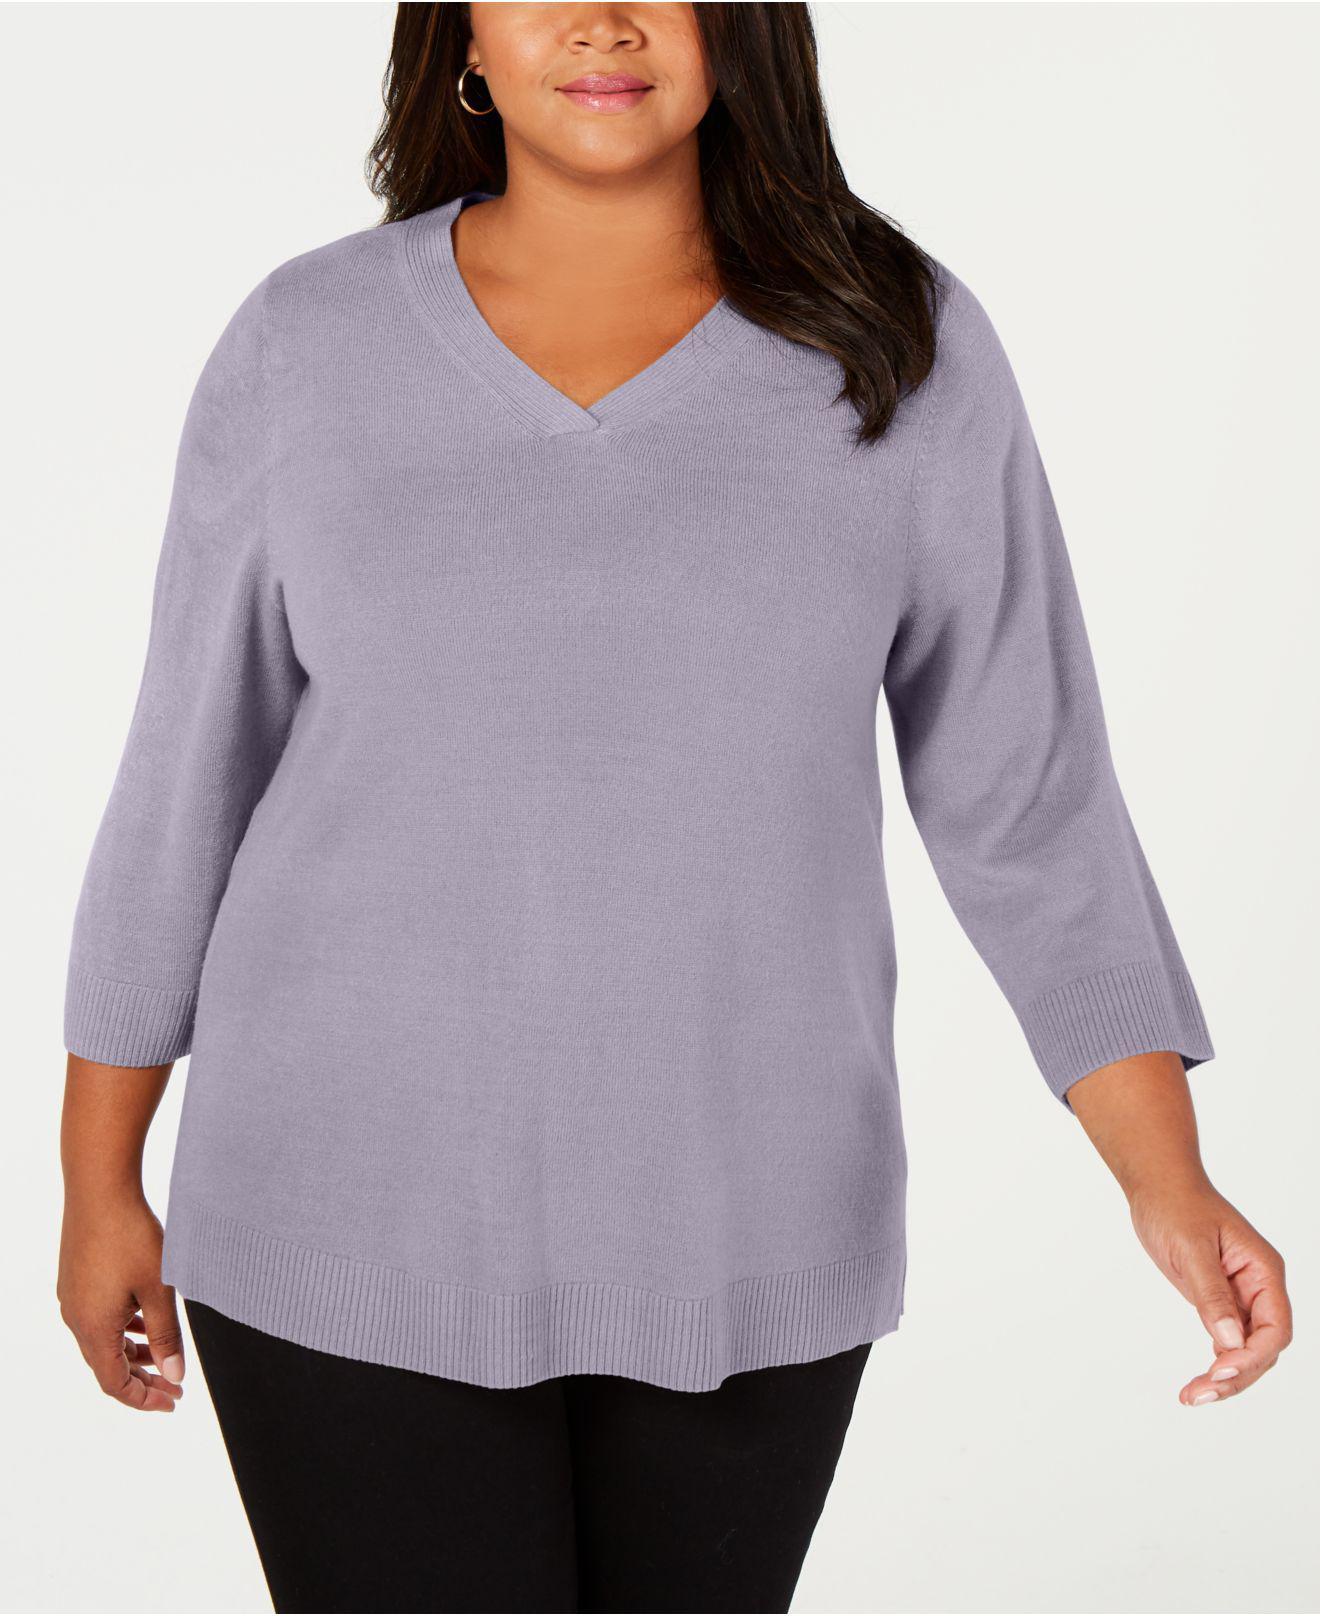 Karen Scott Women/'s Plus Luxsoft V-Neck Pullover 3//4 Sleeve Sweater Size 1X